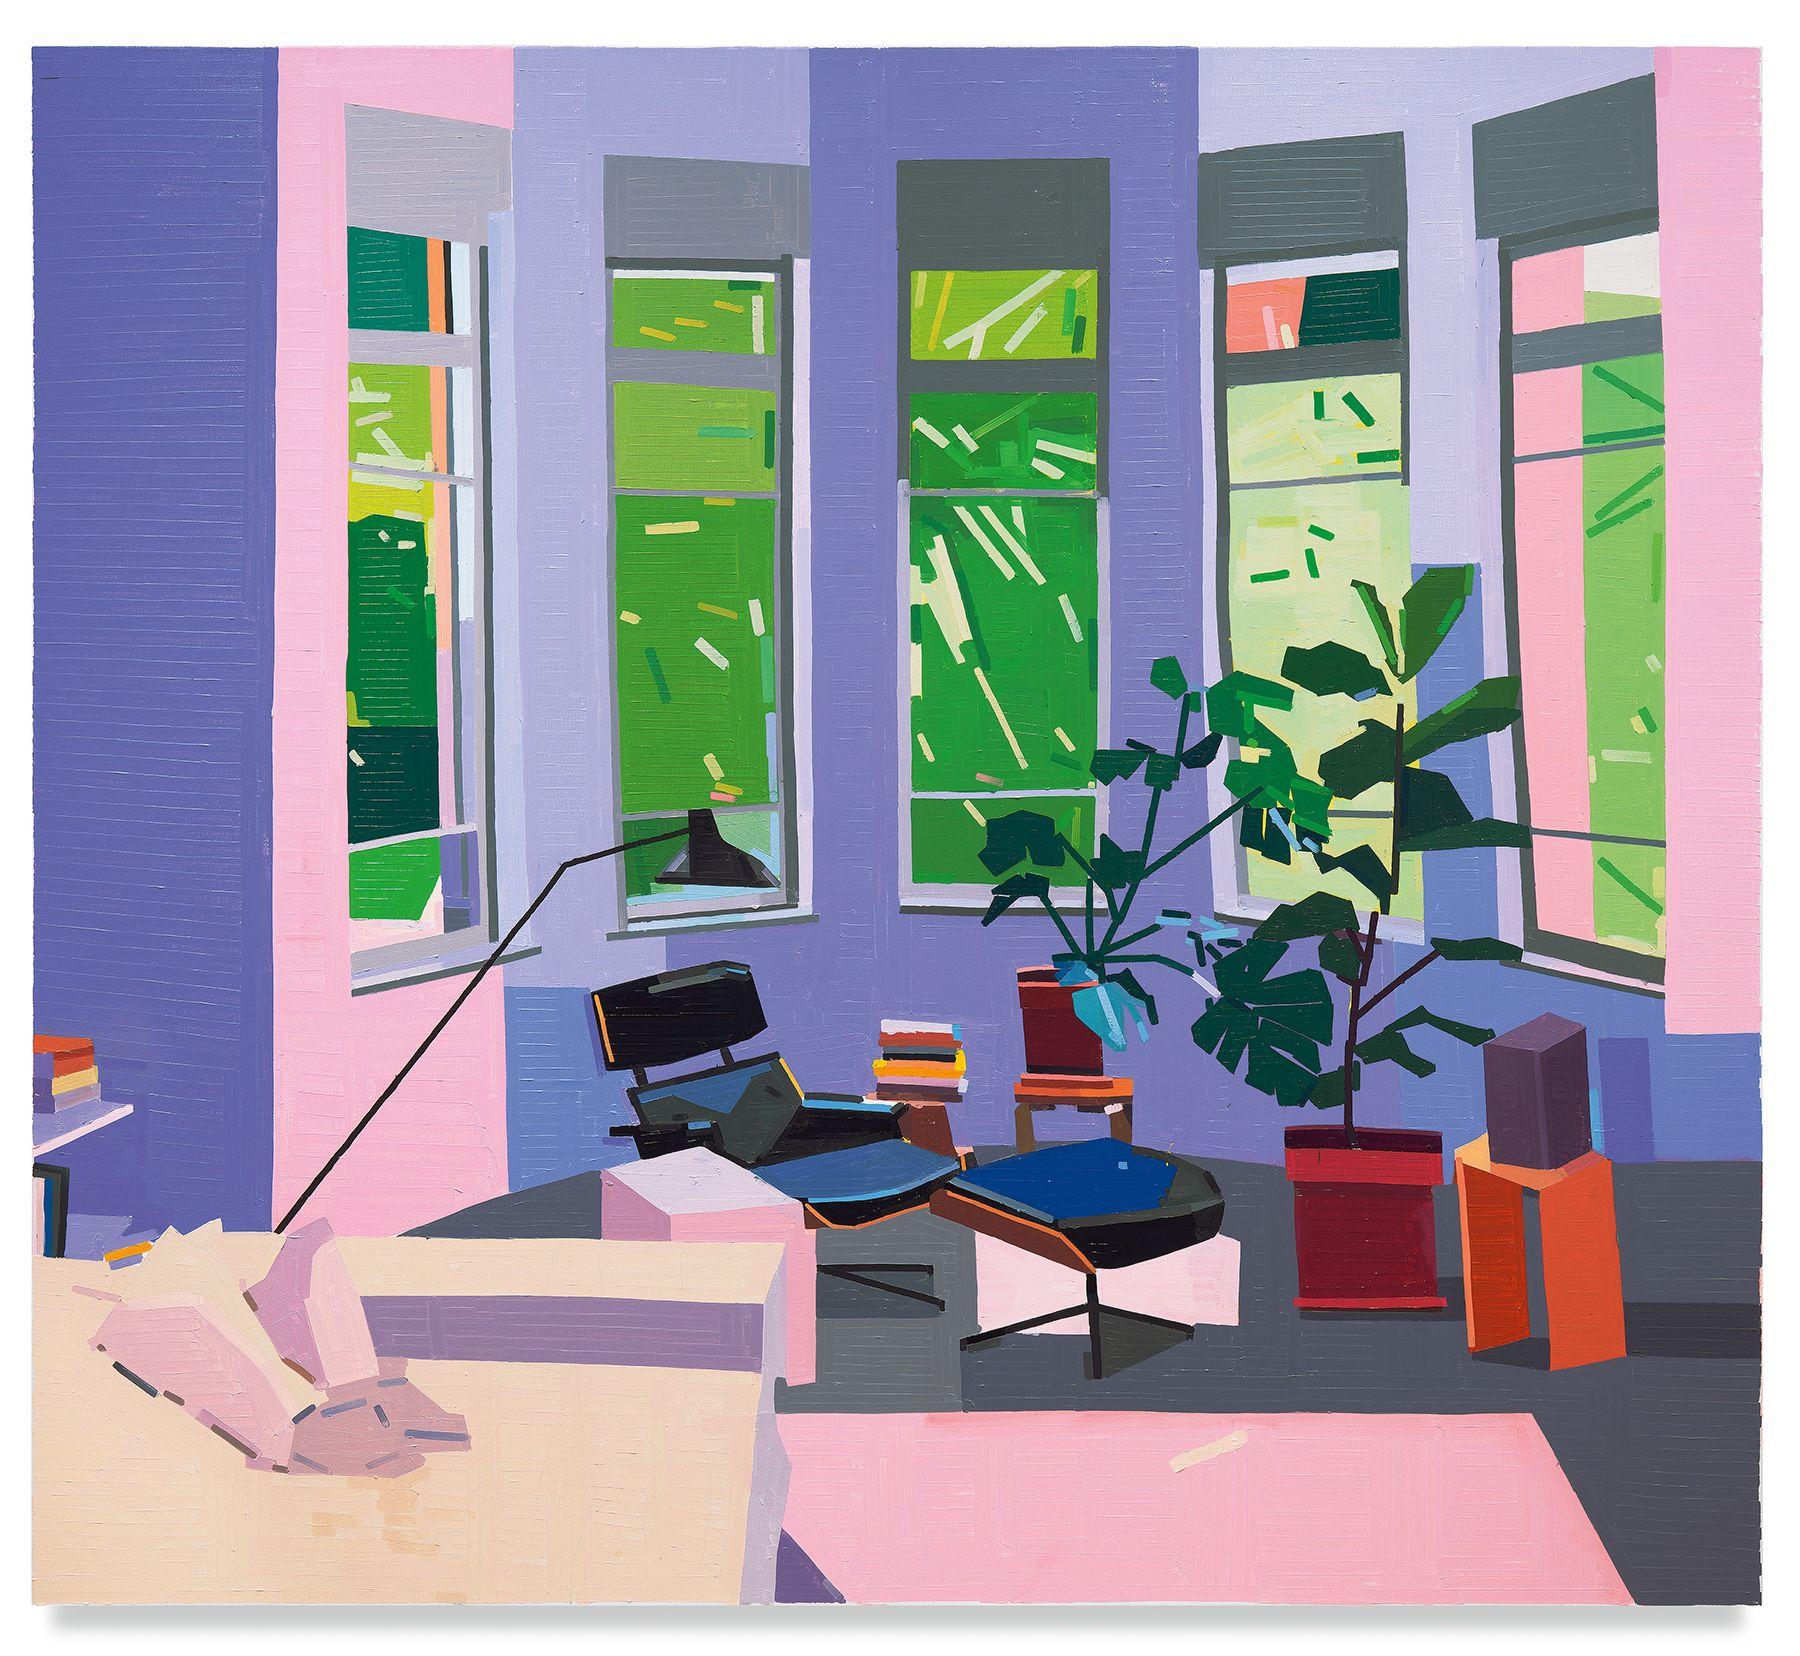 Guy Yanai, Gilboa St Living Room, 2019